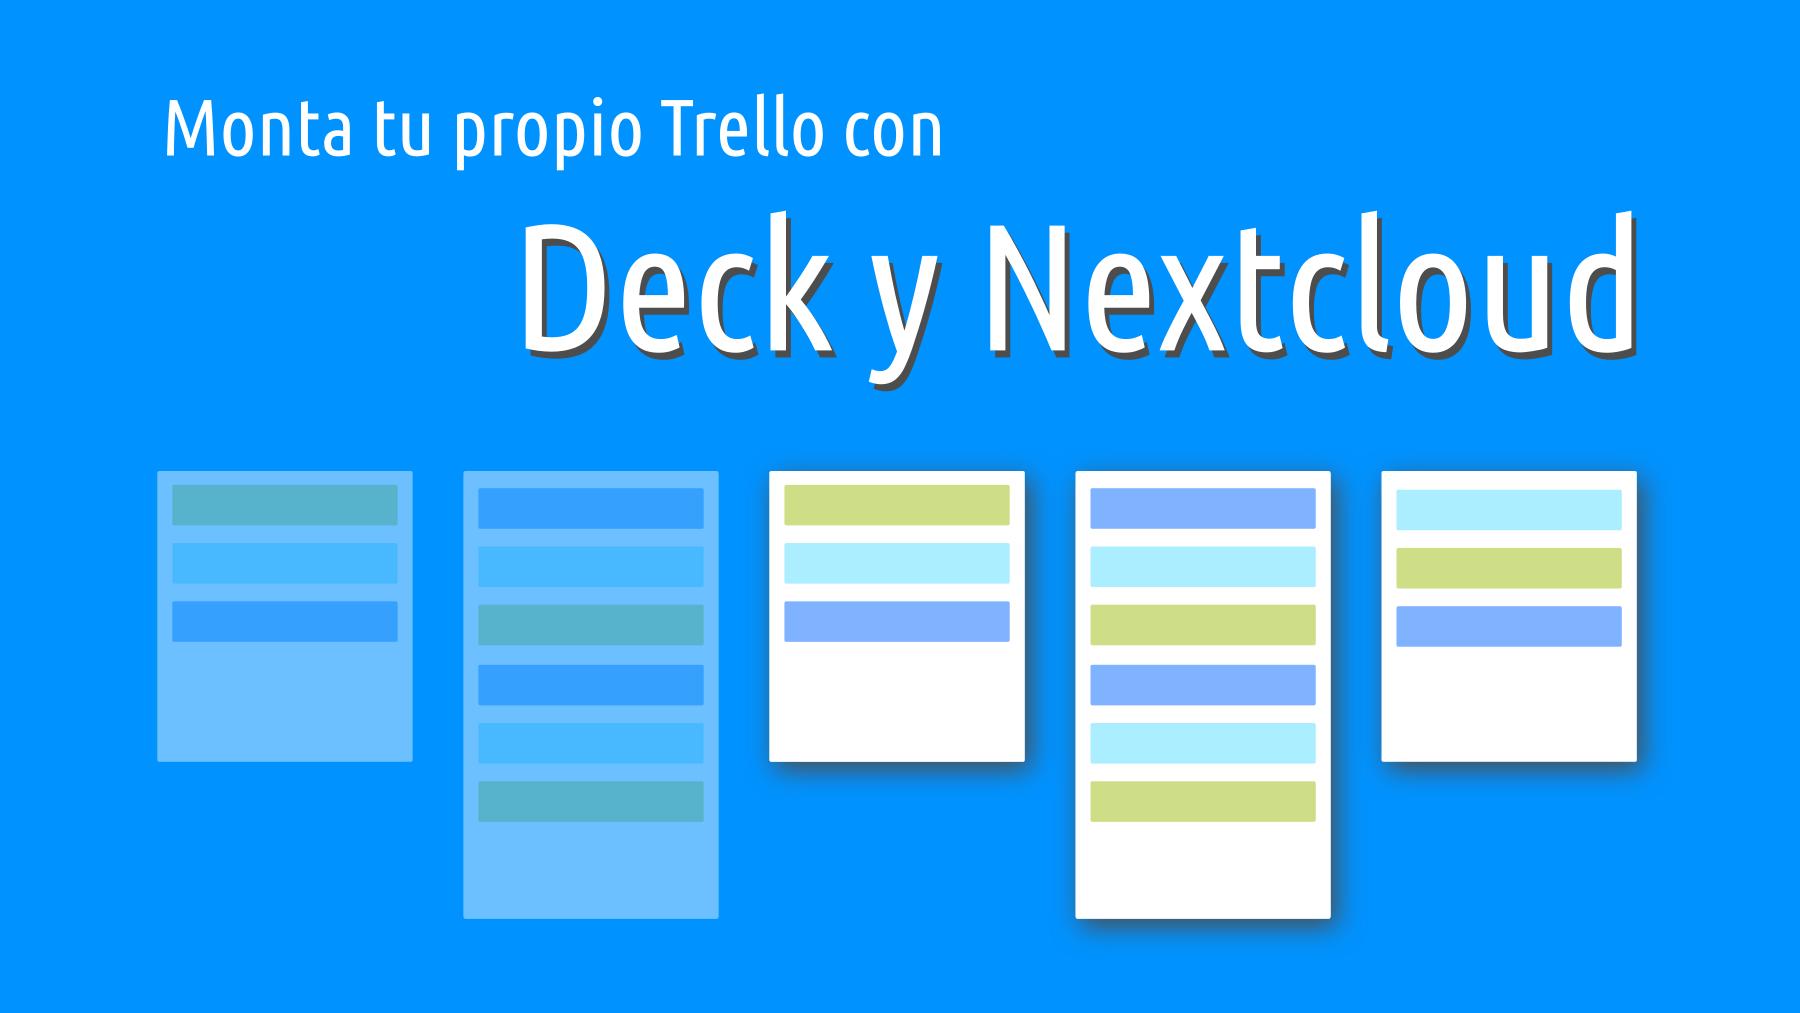 Deck + Nextcloud